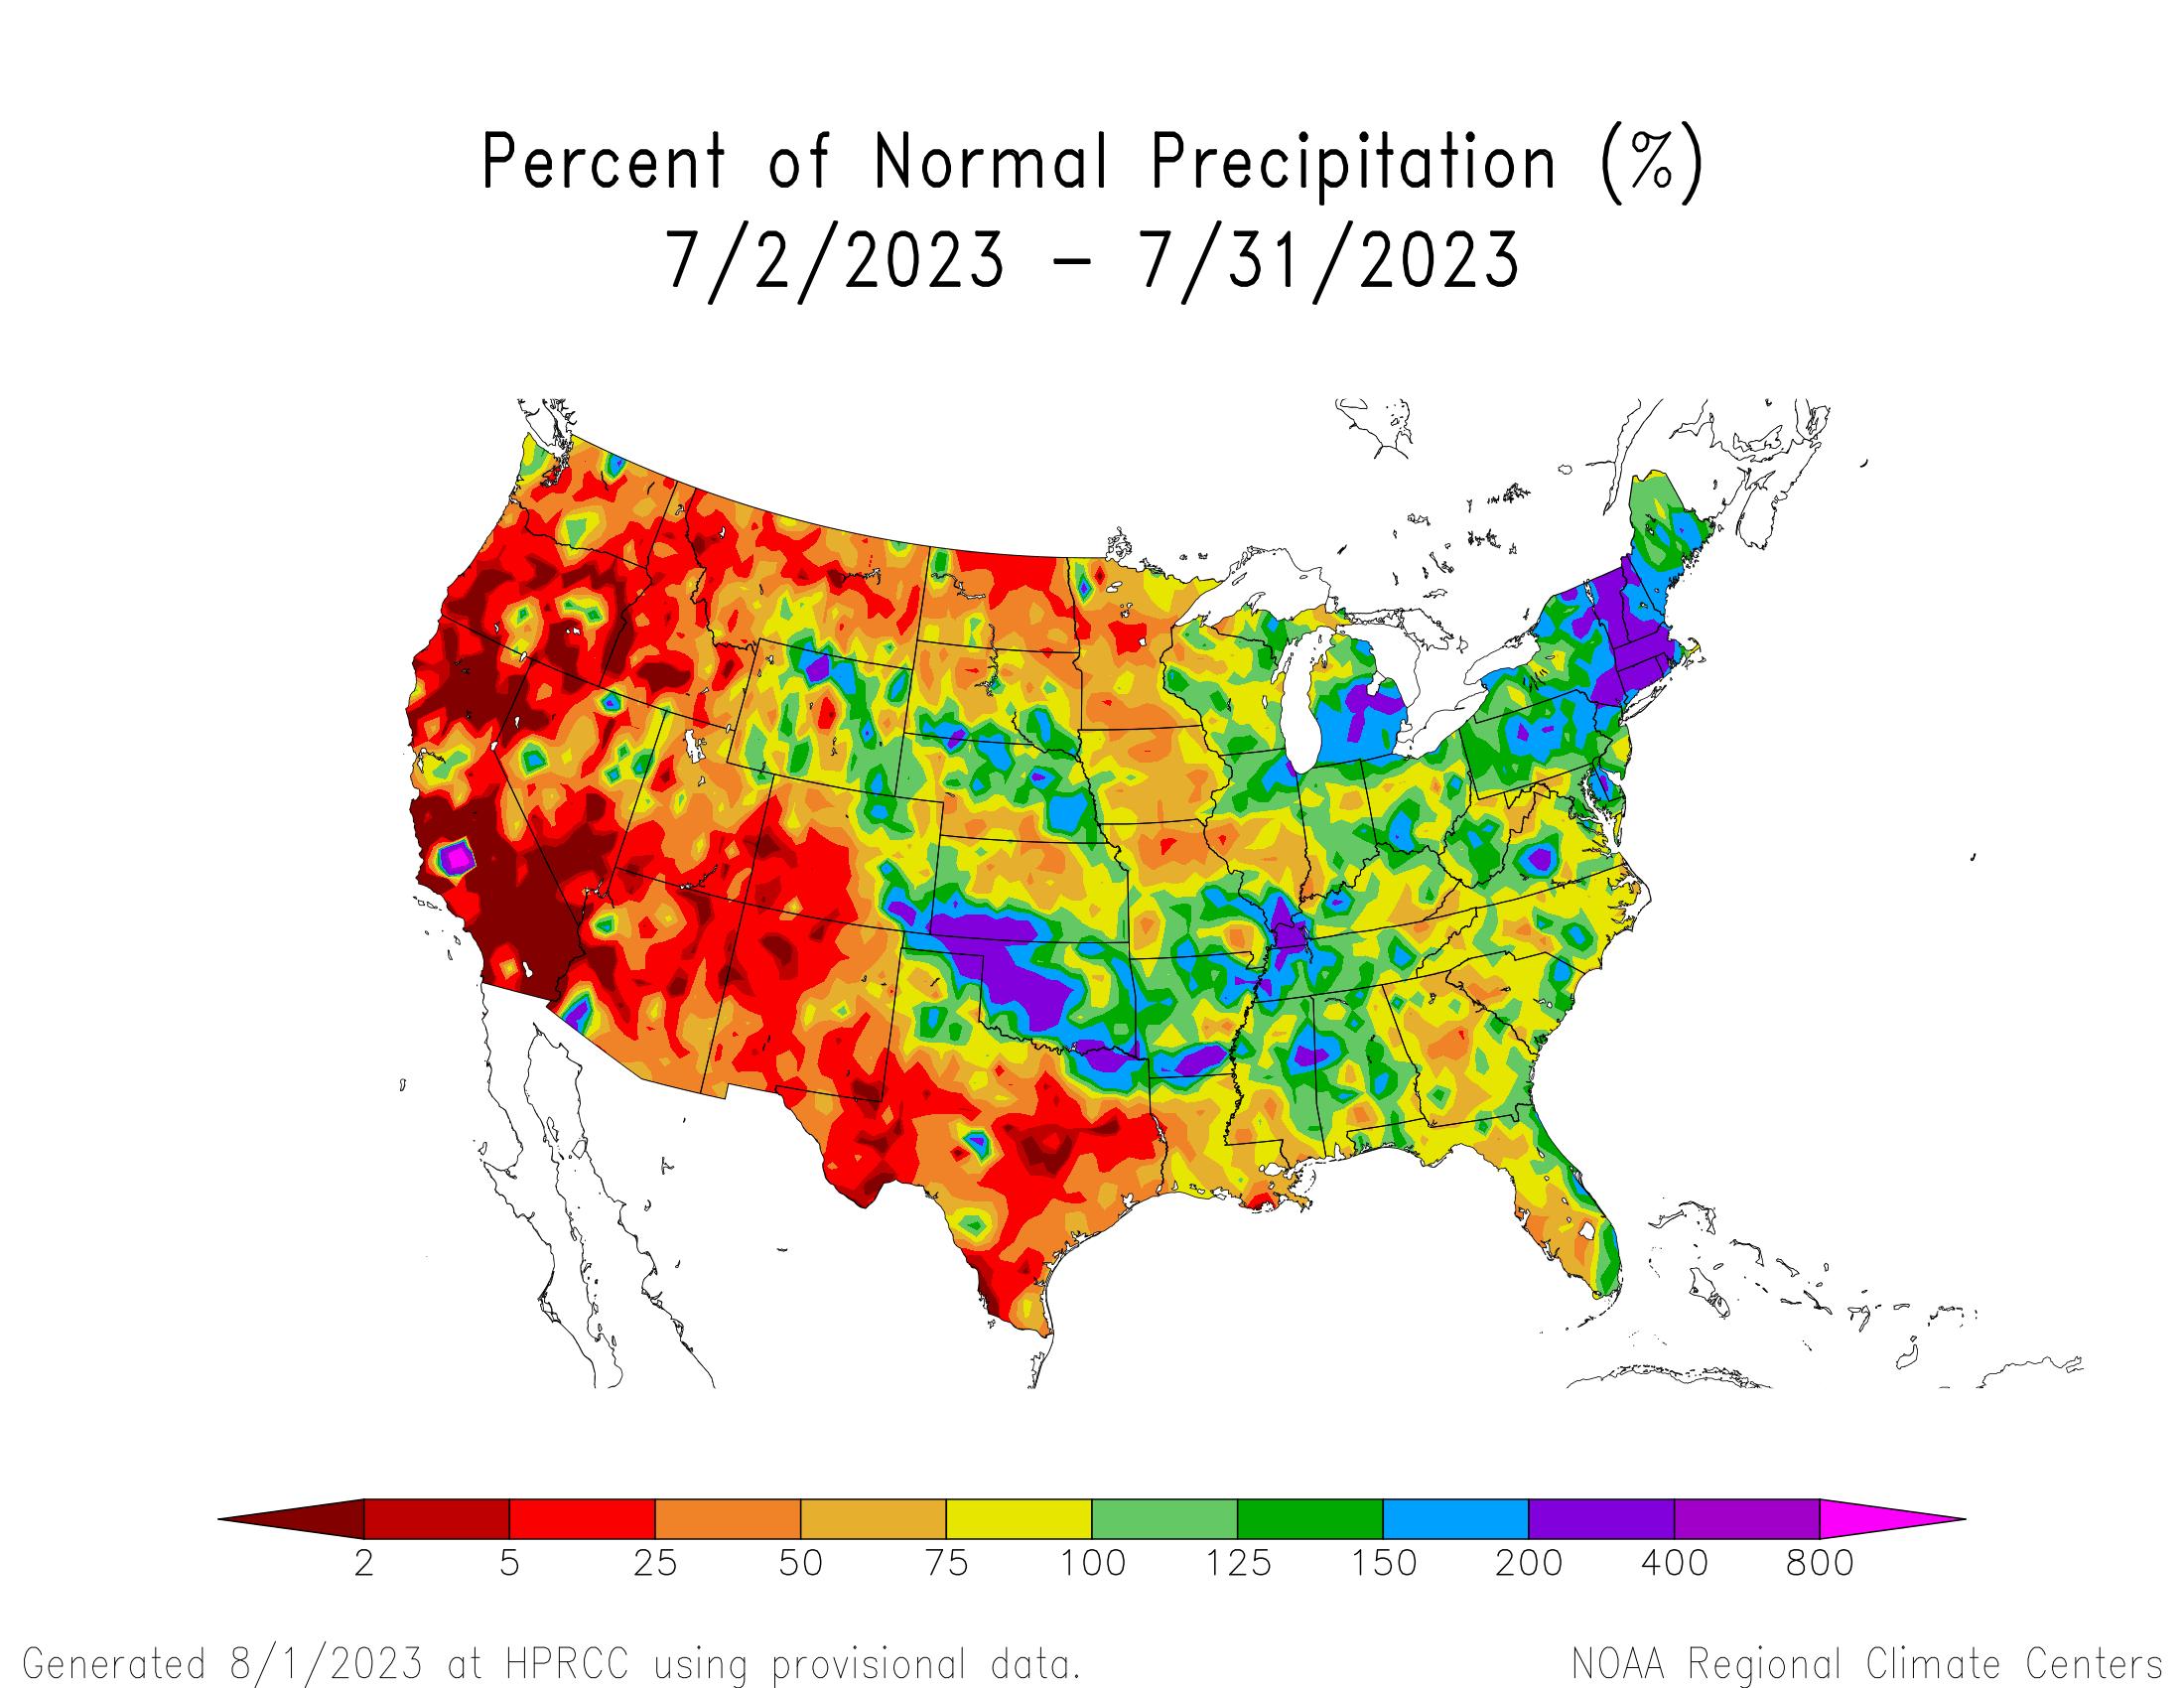 30-day Precipitation Percent of Normal